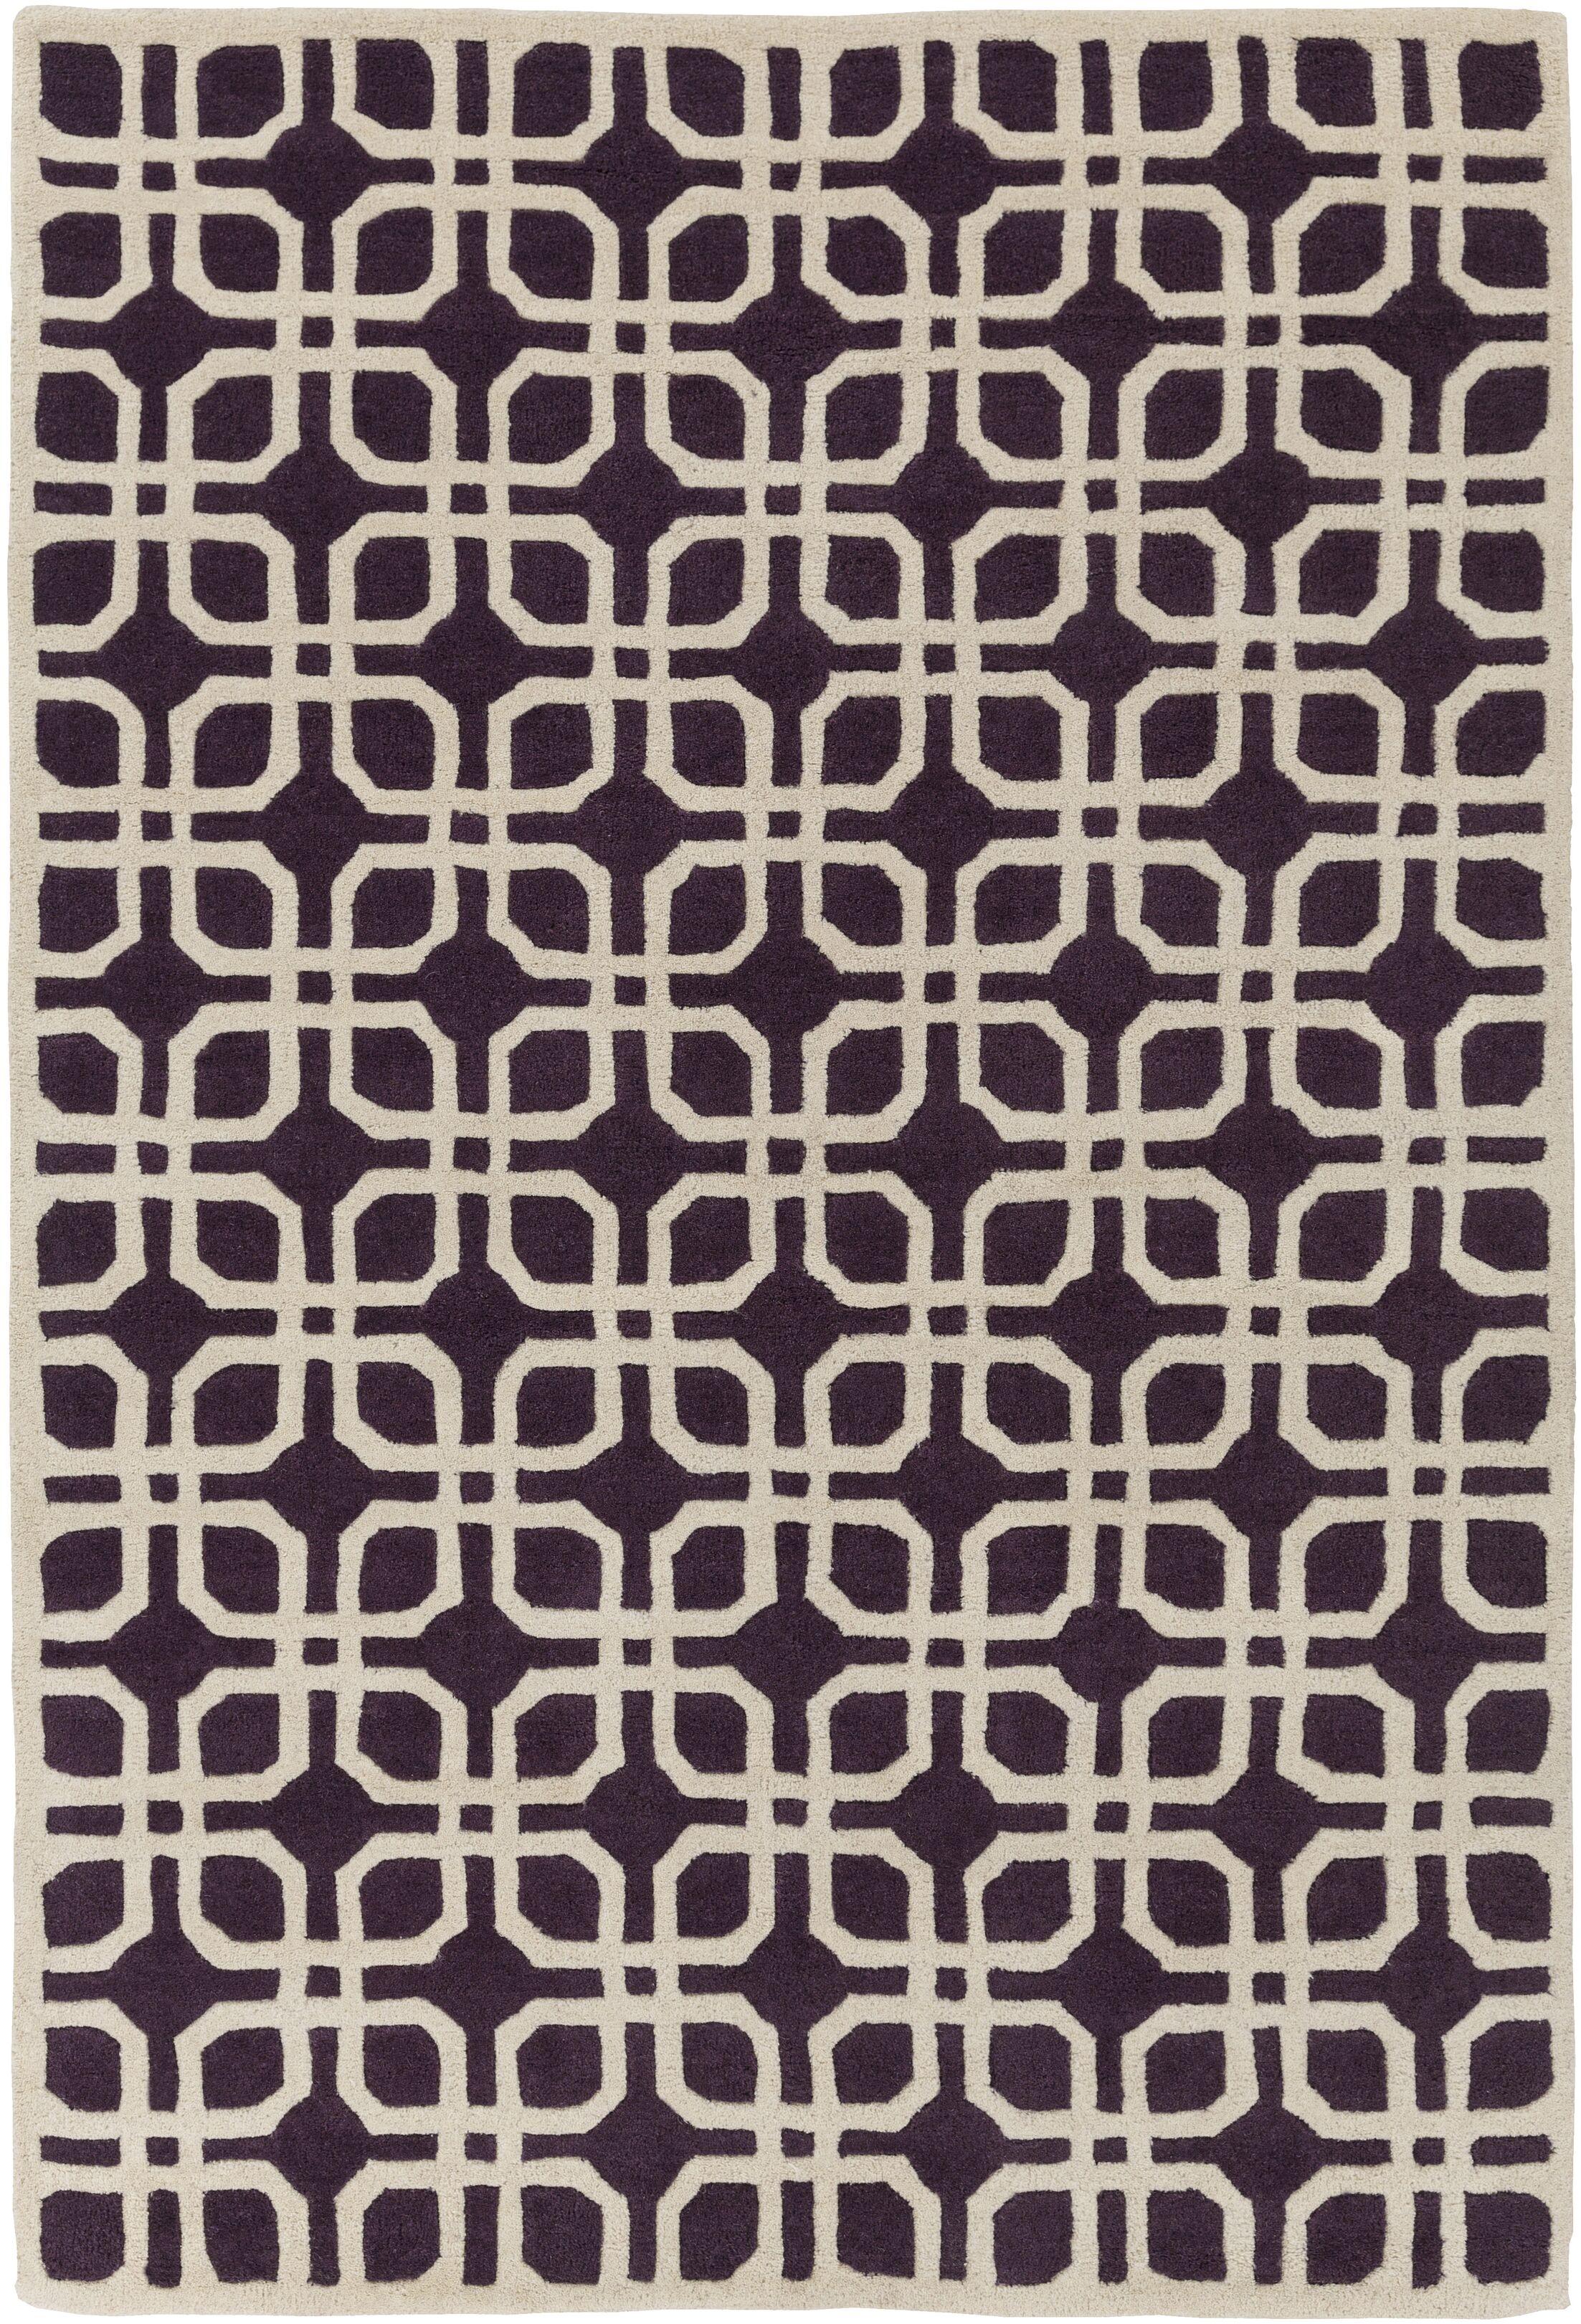 Murrah Purple/Ivory Area Rug Rug Size: Rectangle 5' x 8'